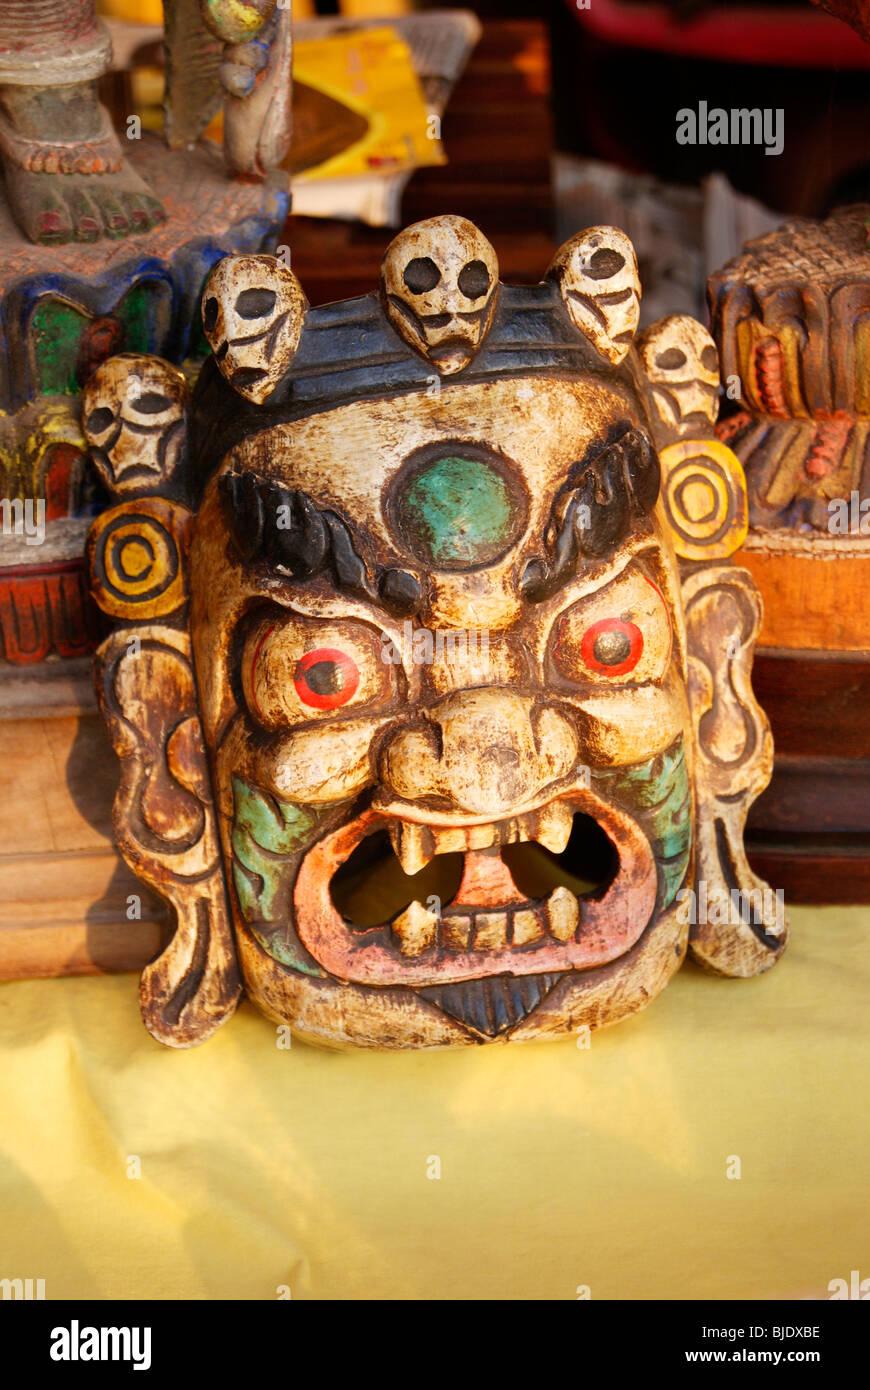 Schaurige Maske Stockbild